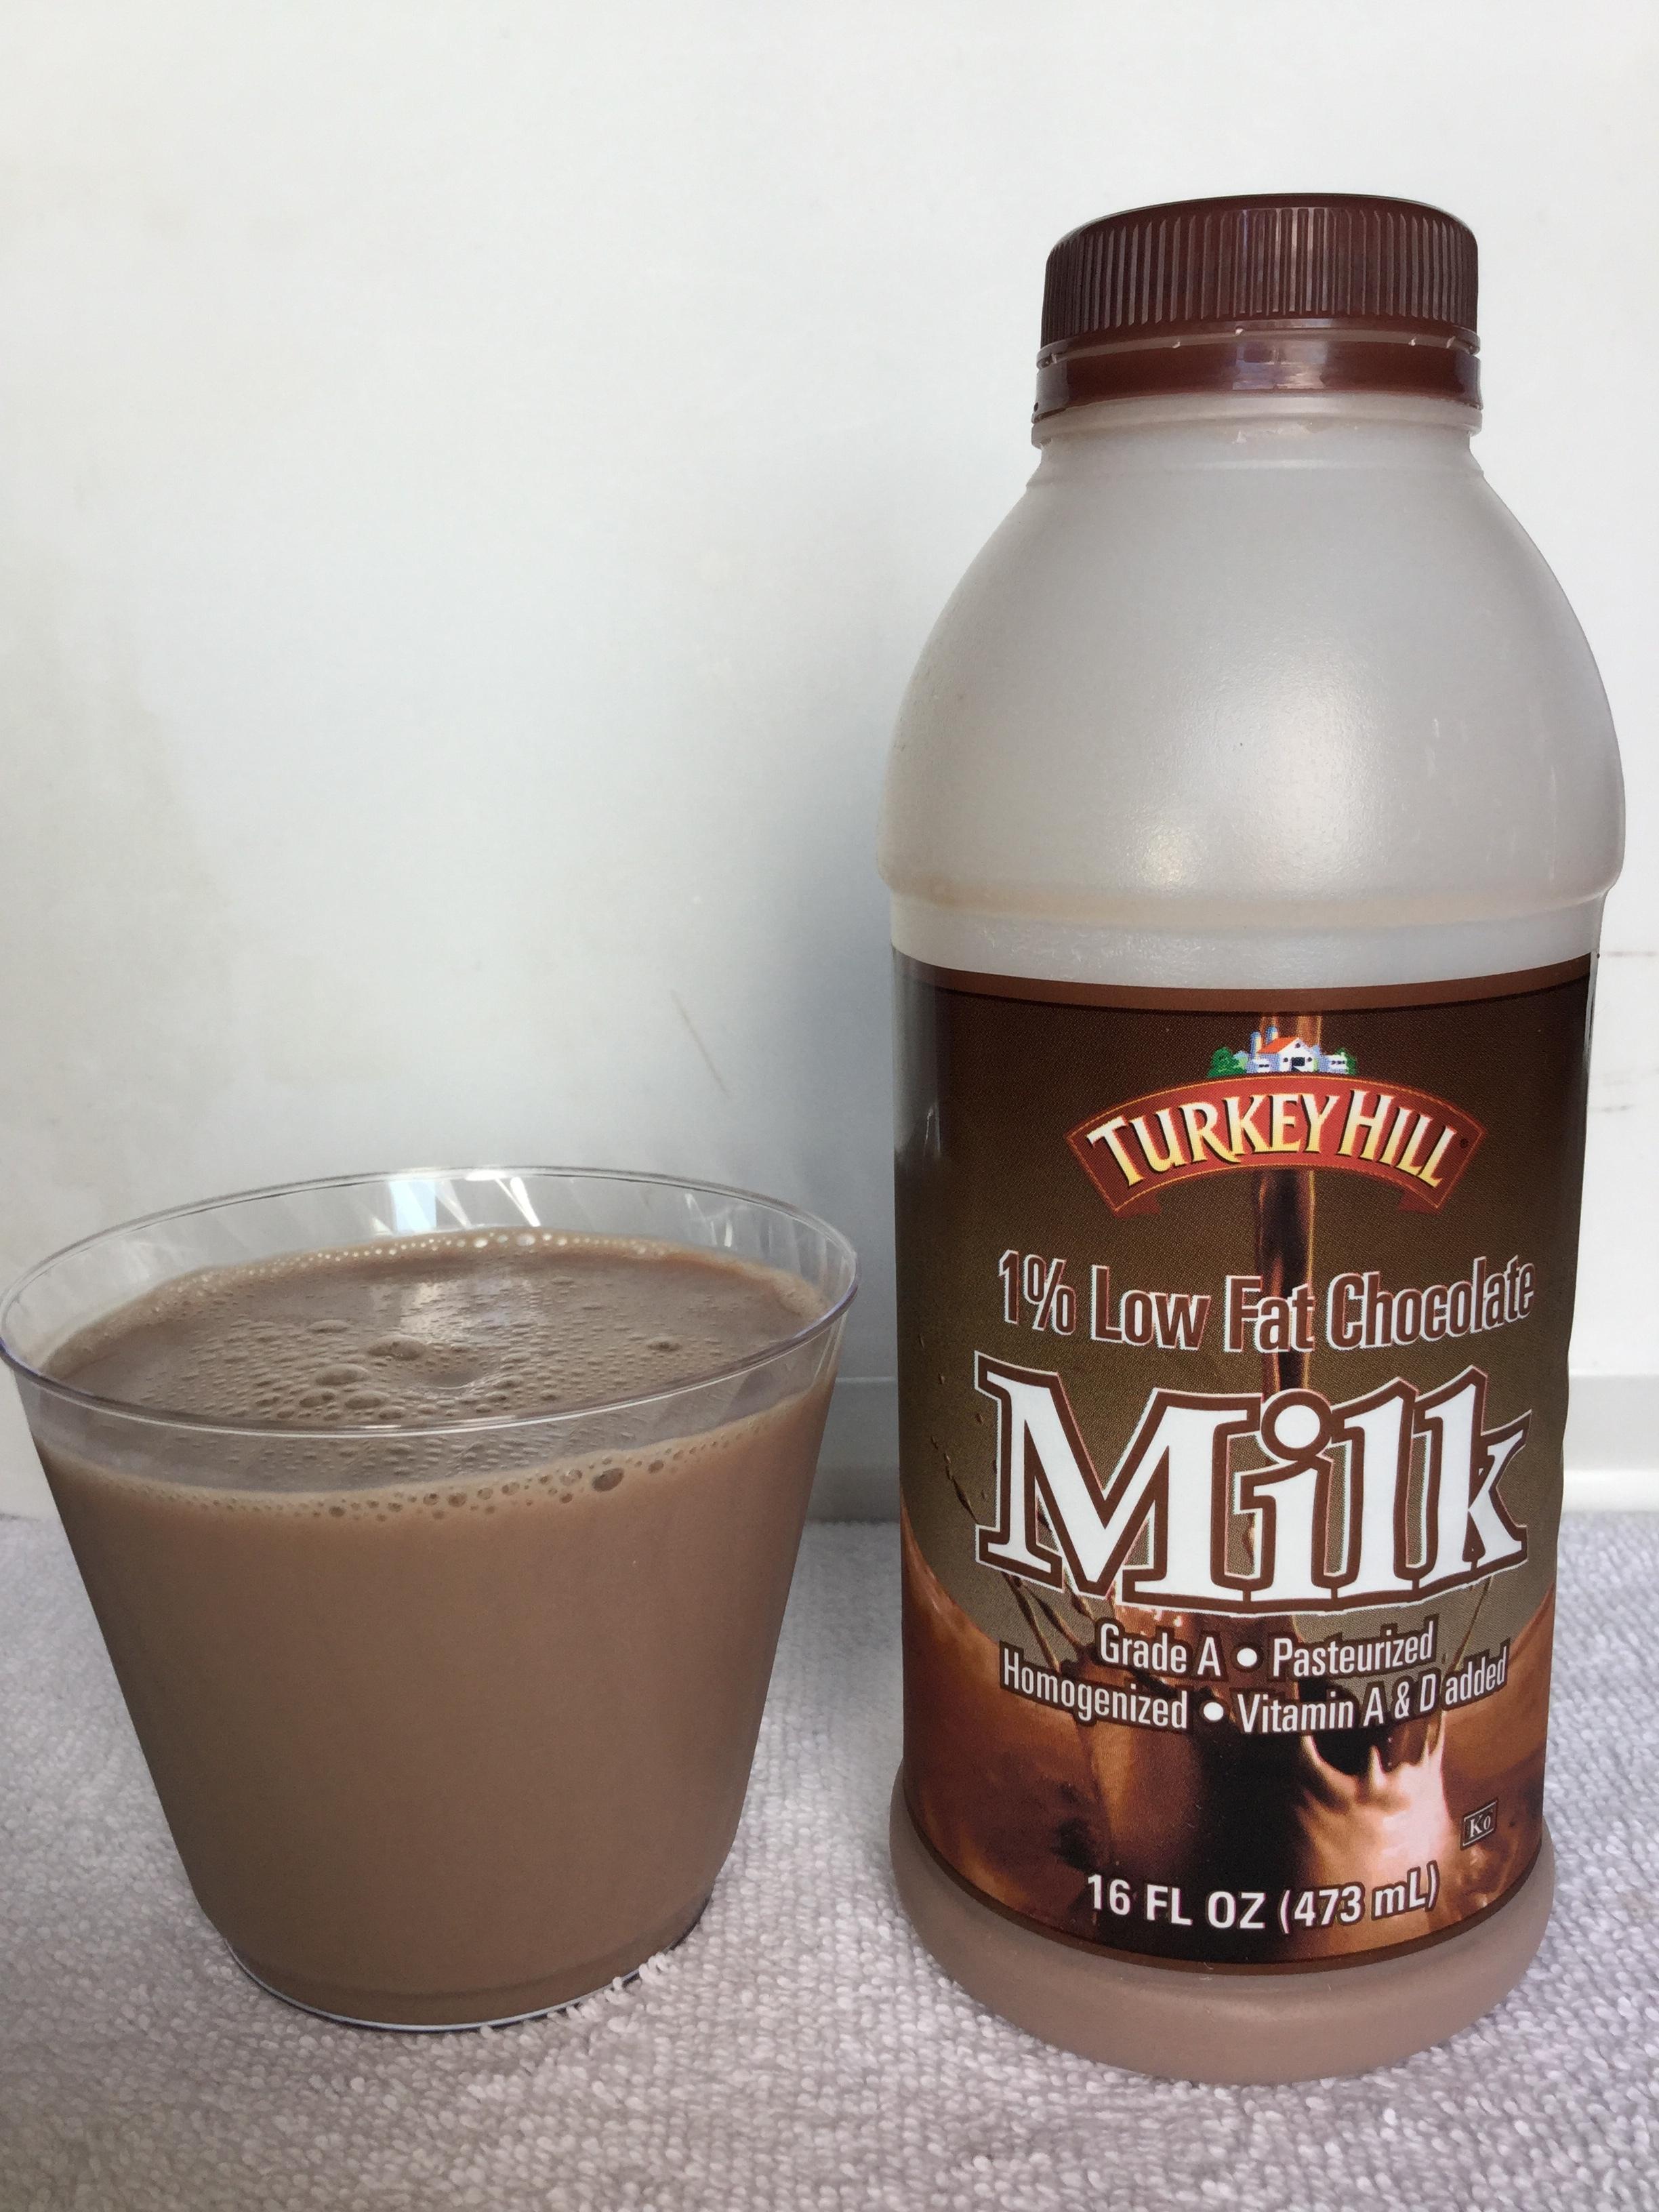 Turkey Hill Low Fat Chocolate Milk Cup